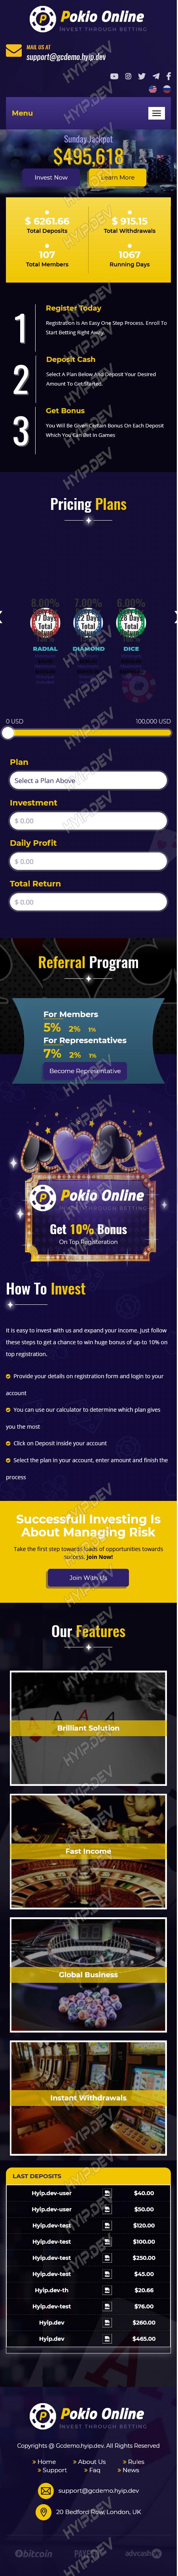 goldcoders hyip template no. 130, responsive page screenshot